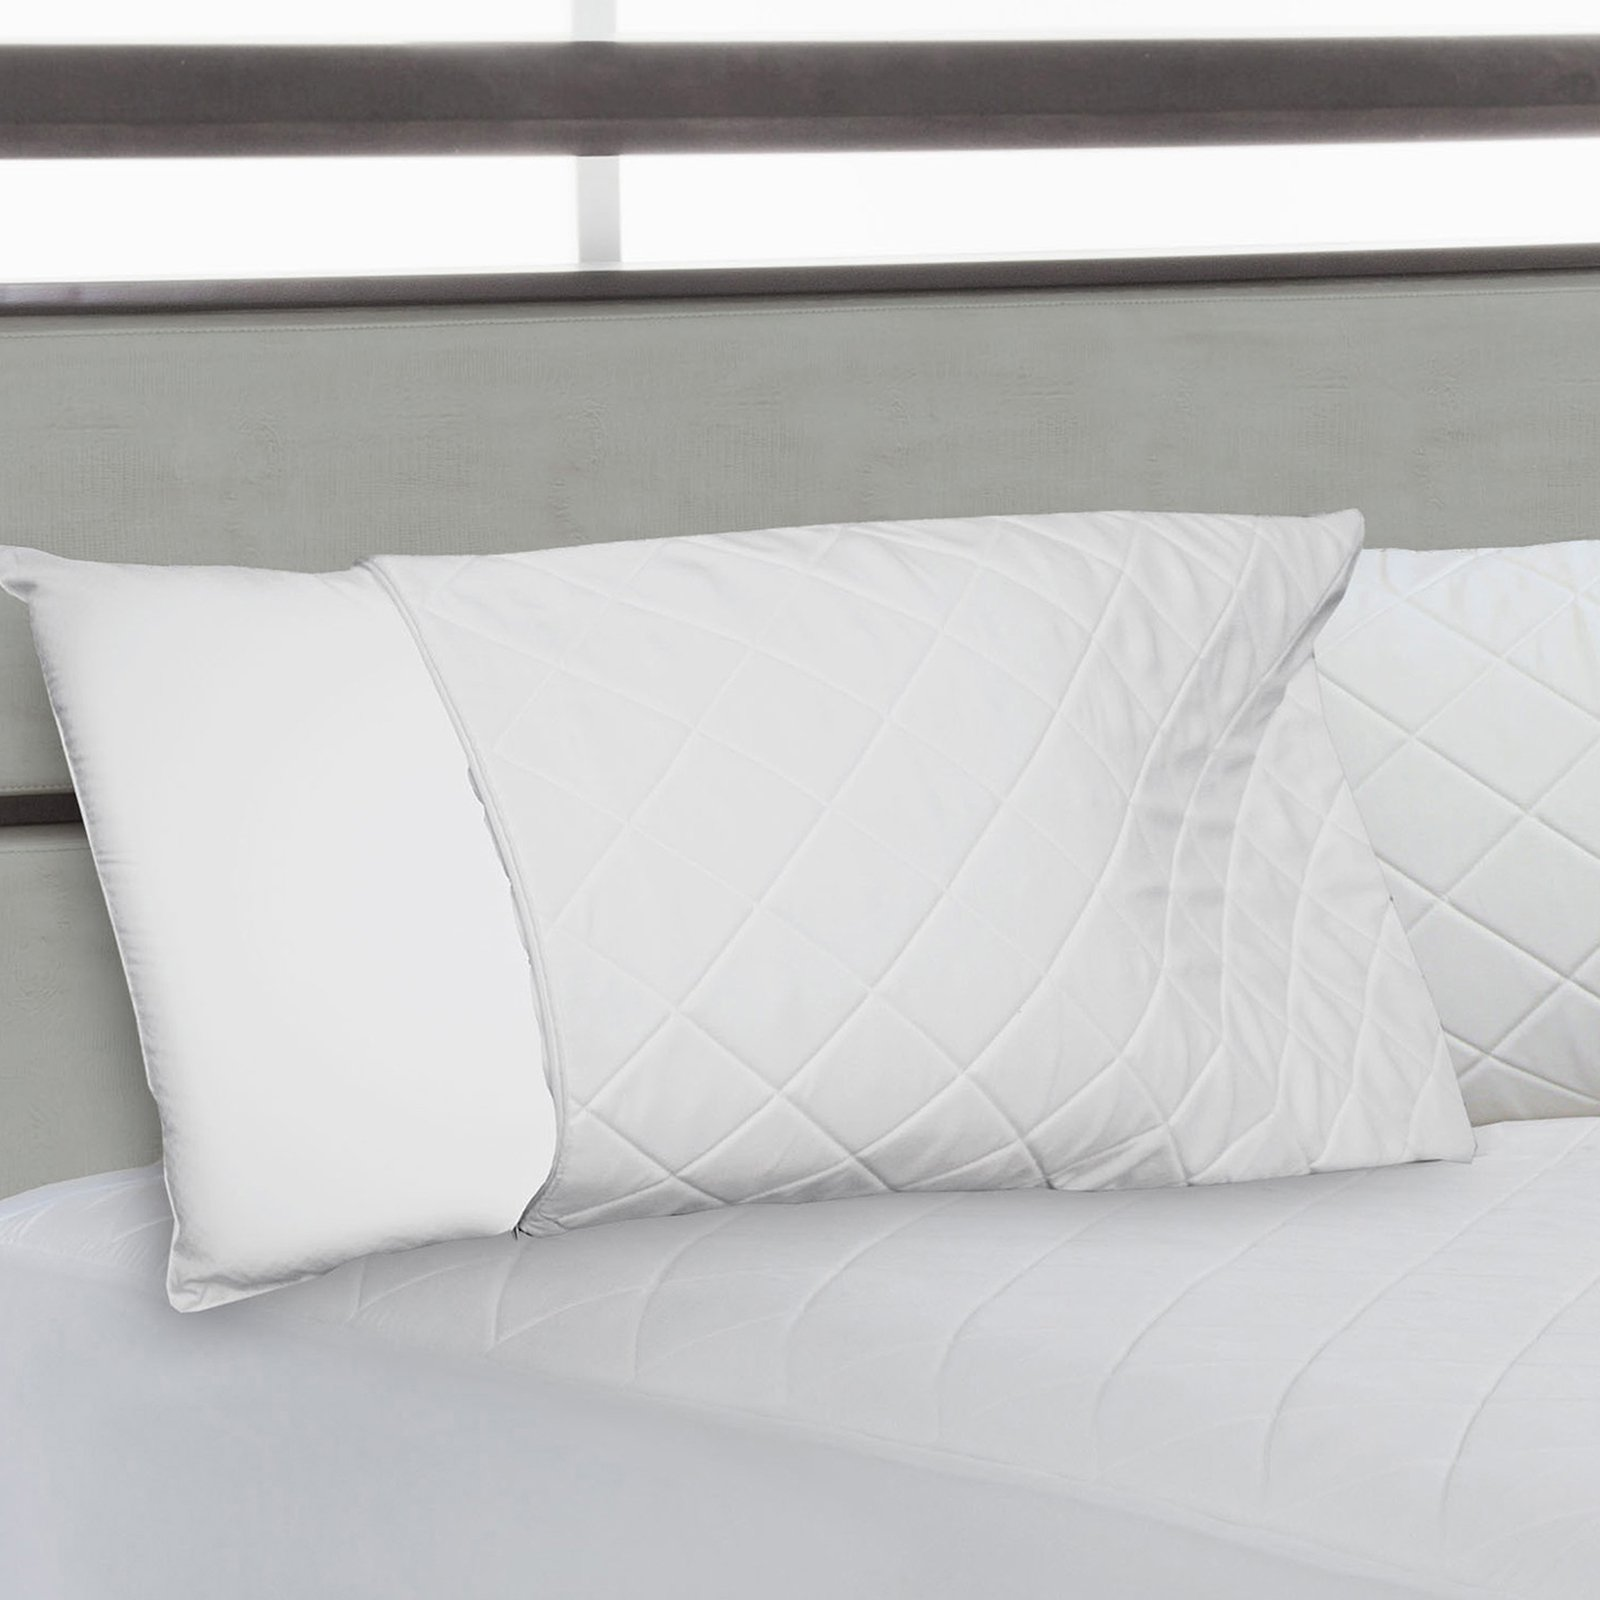 Perfect Fit Quilted Memory Foam Zipper Pillow Enhancer